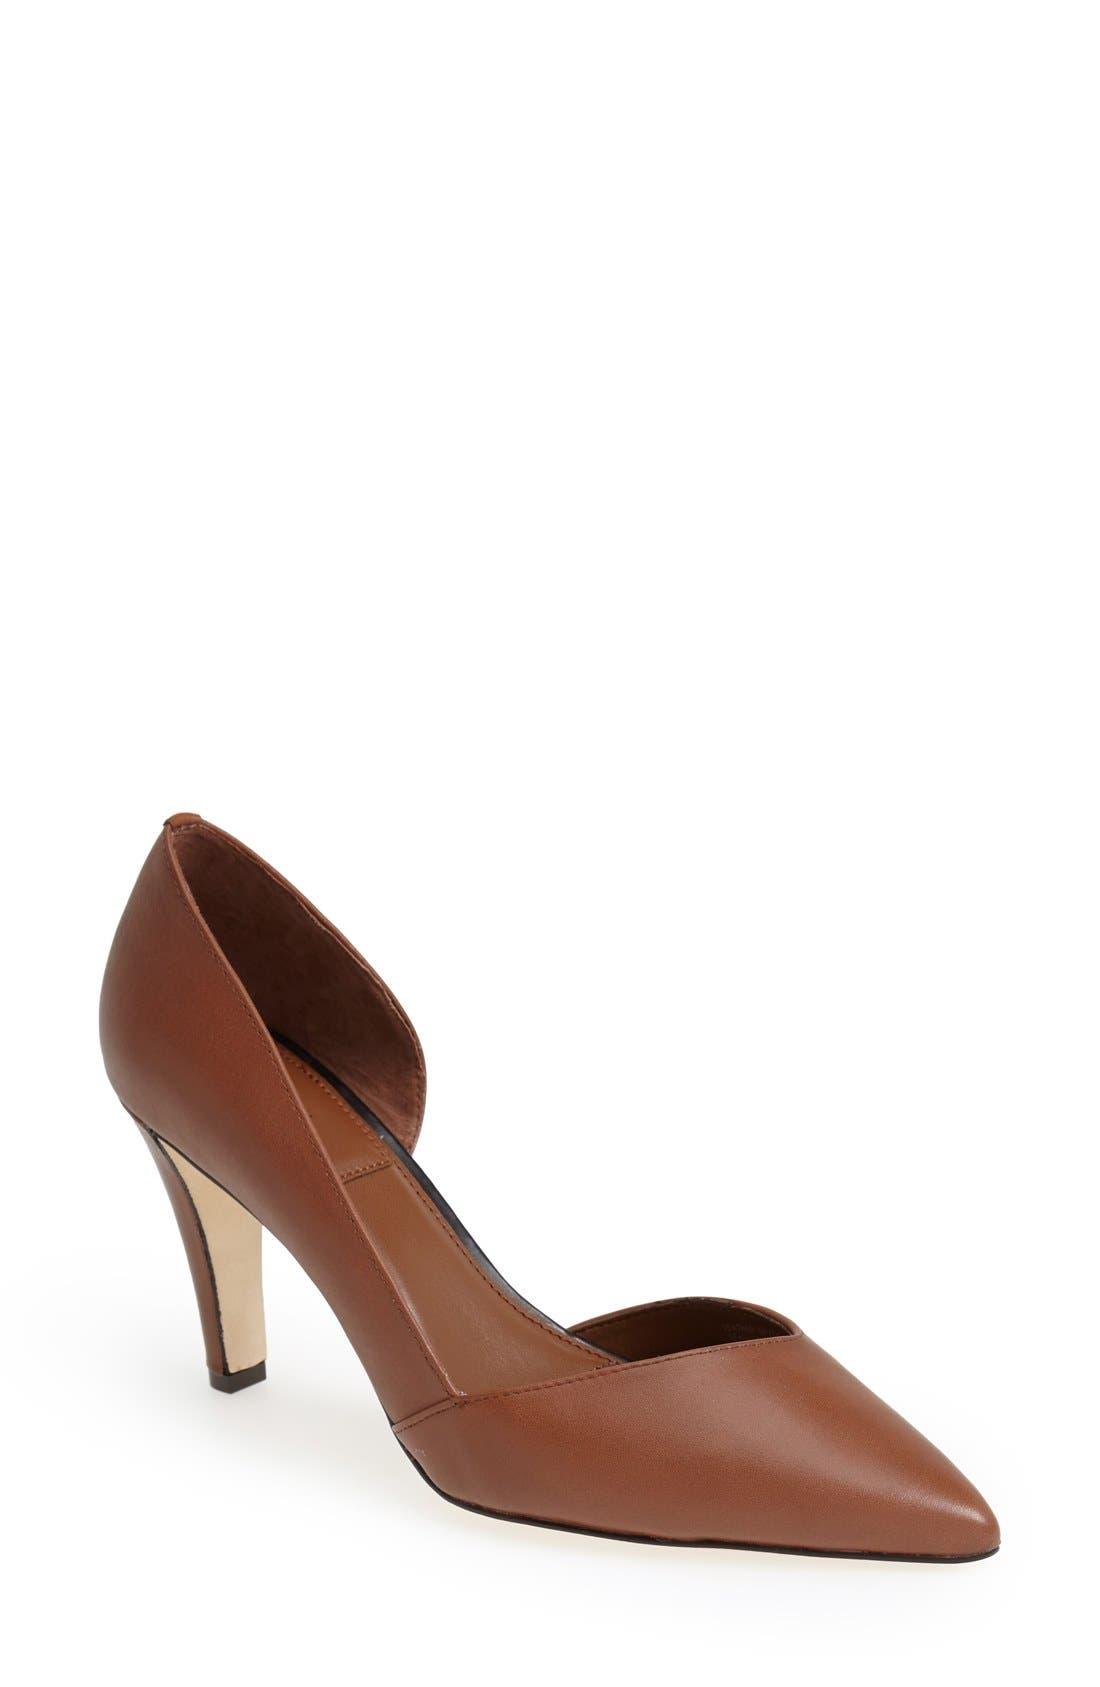 Alternate Image 1 Selected - T Tahari 'Lars' Pointy Toe Leather Pump (Women)